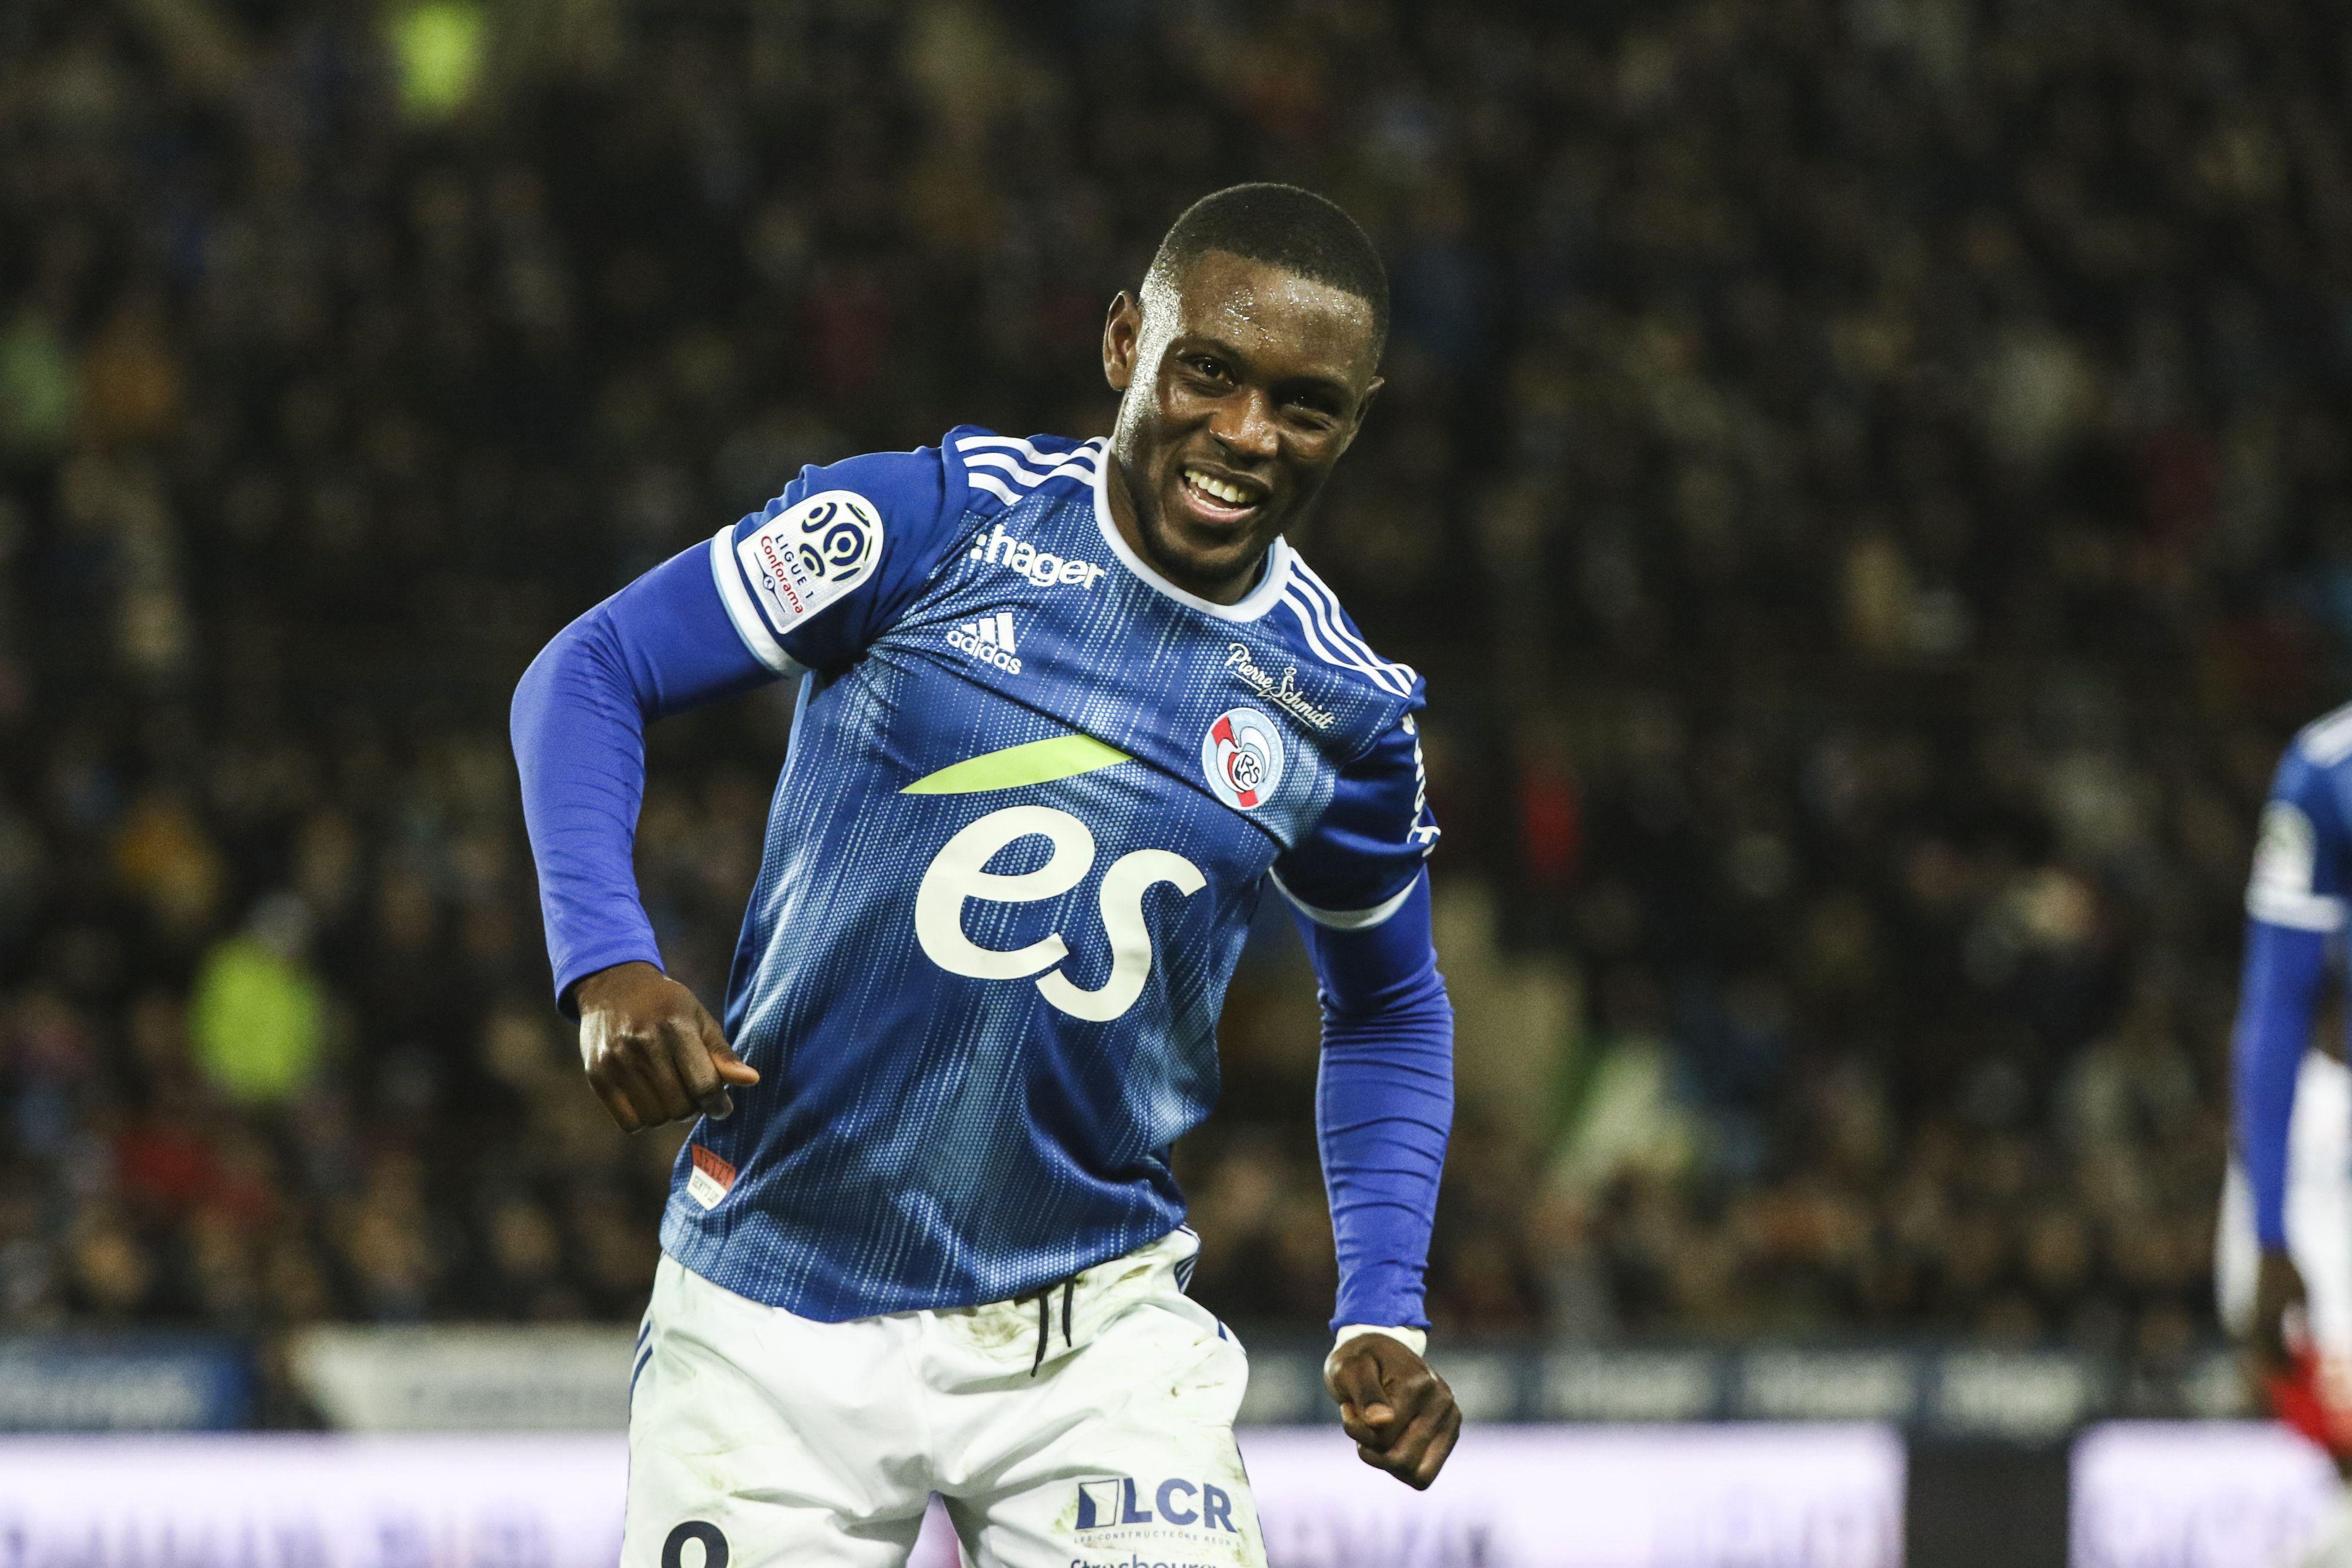 Football - Ligue 1 - Majeed Waris, un buteur qui aime la France